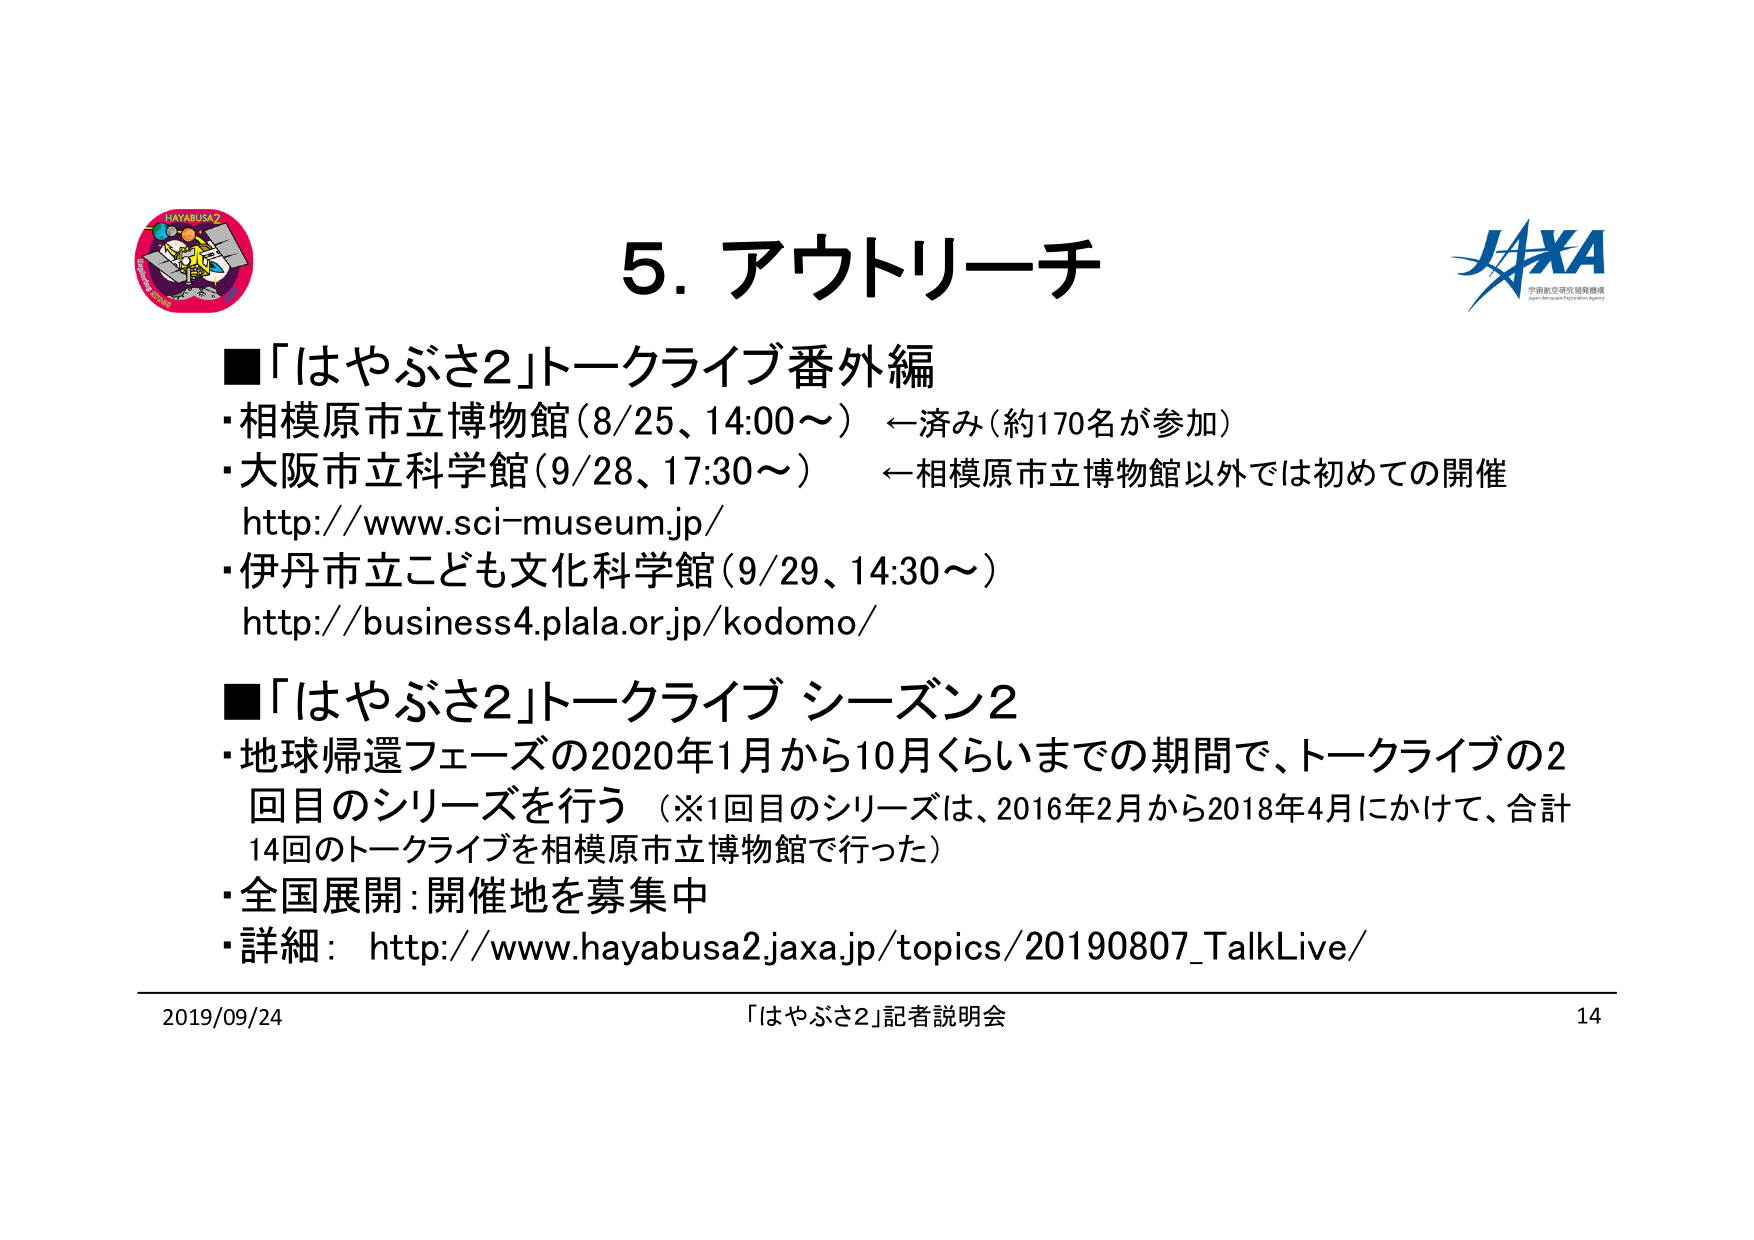 f:id:Imamura:20190924122553p:plain